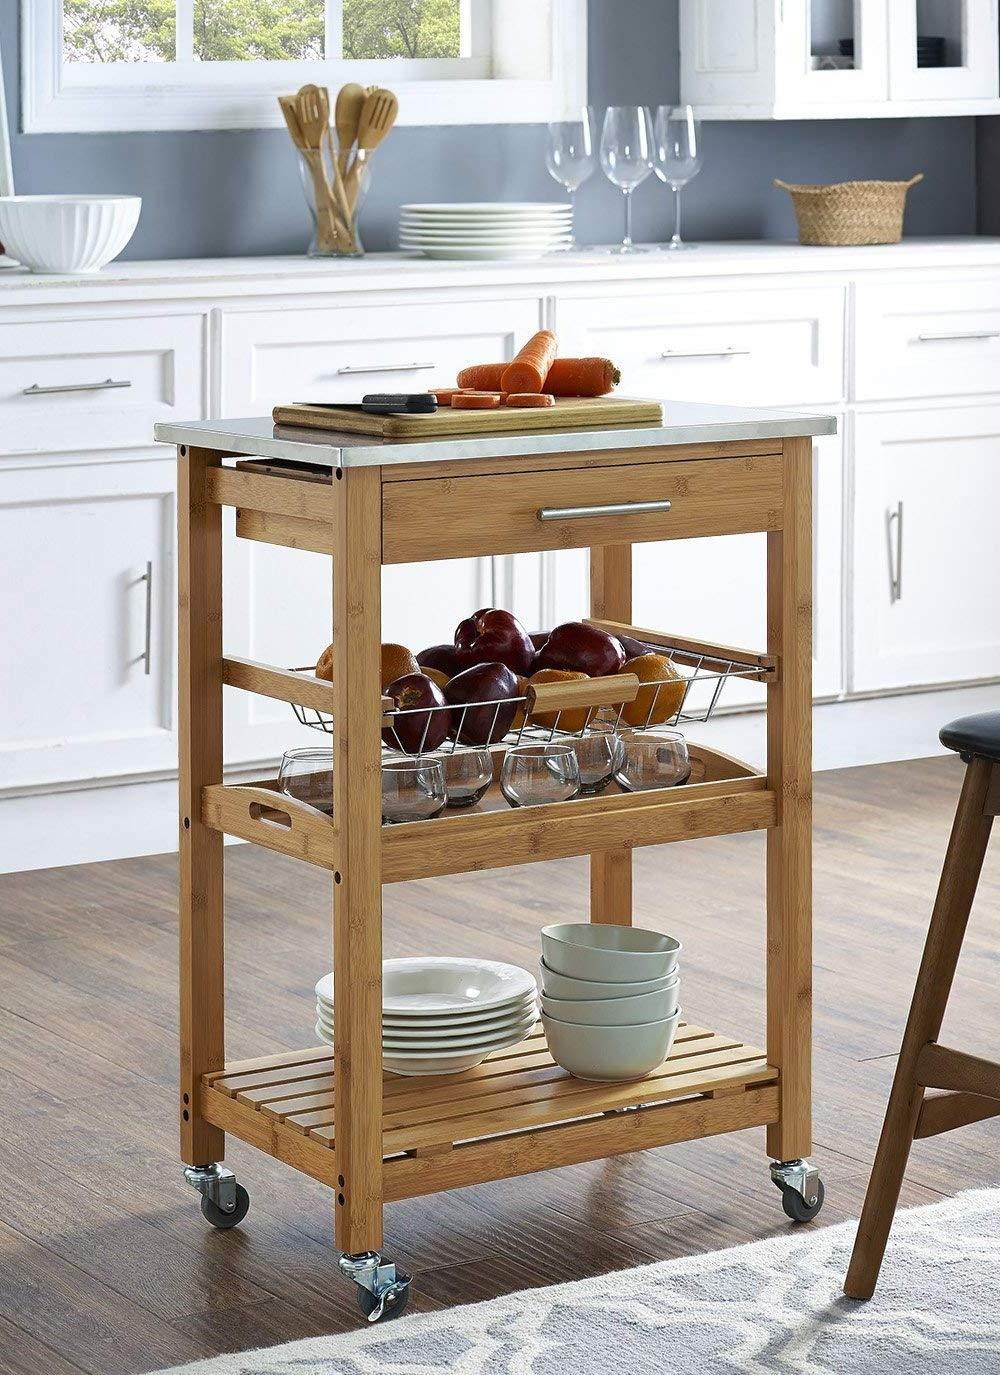 Amazon.com - Stainless Steel Top Kitchen Island, Portable ...